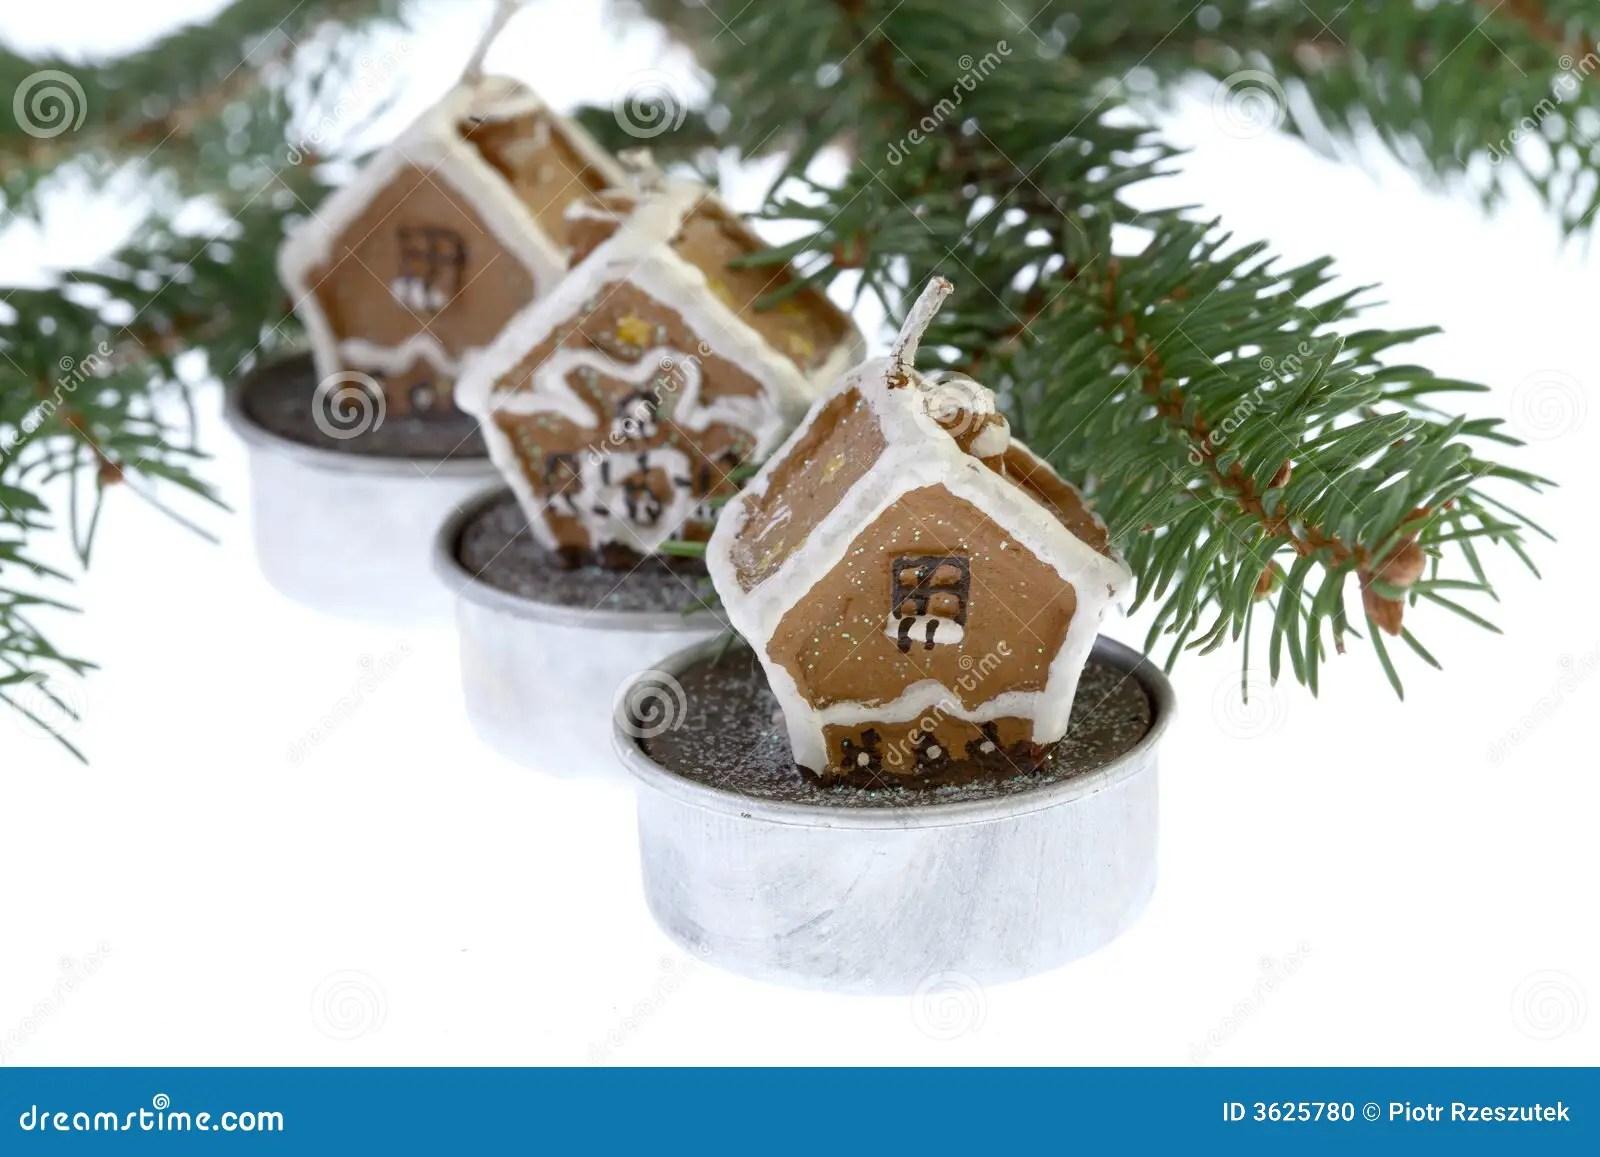 Christmas And Realestate Theme On White Stock Photo